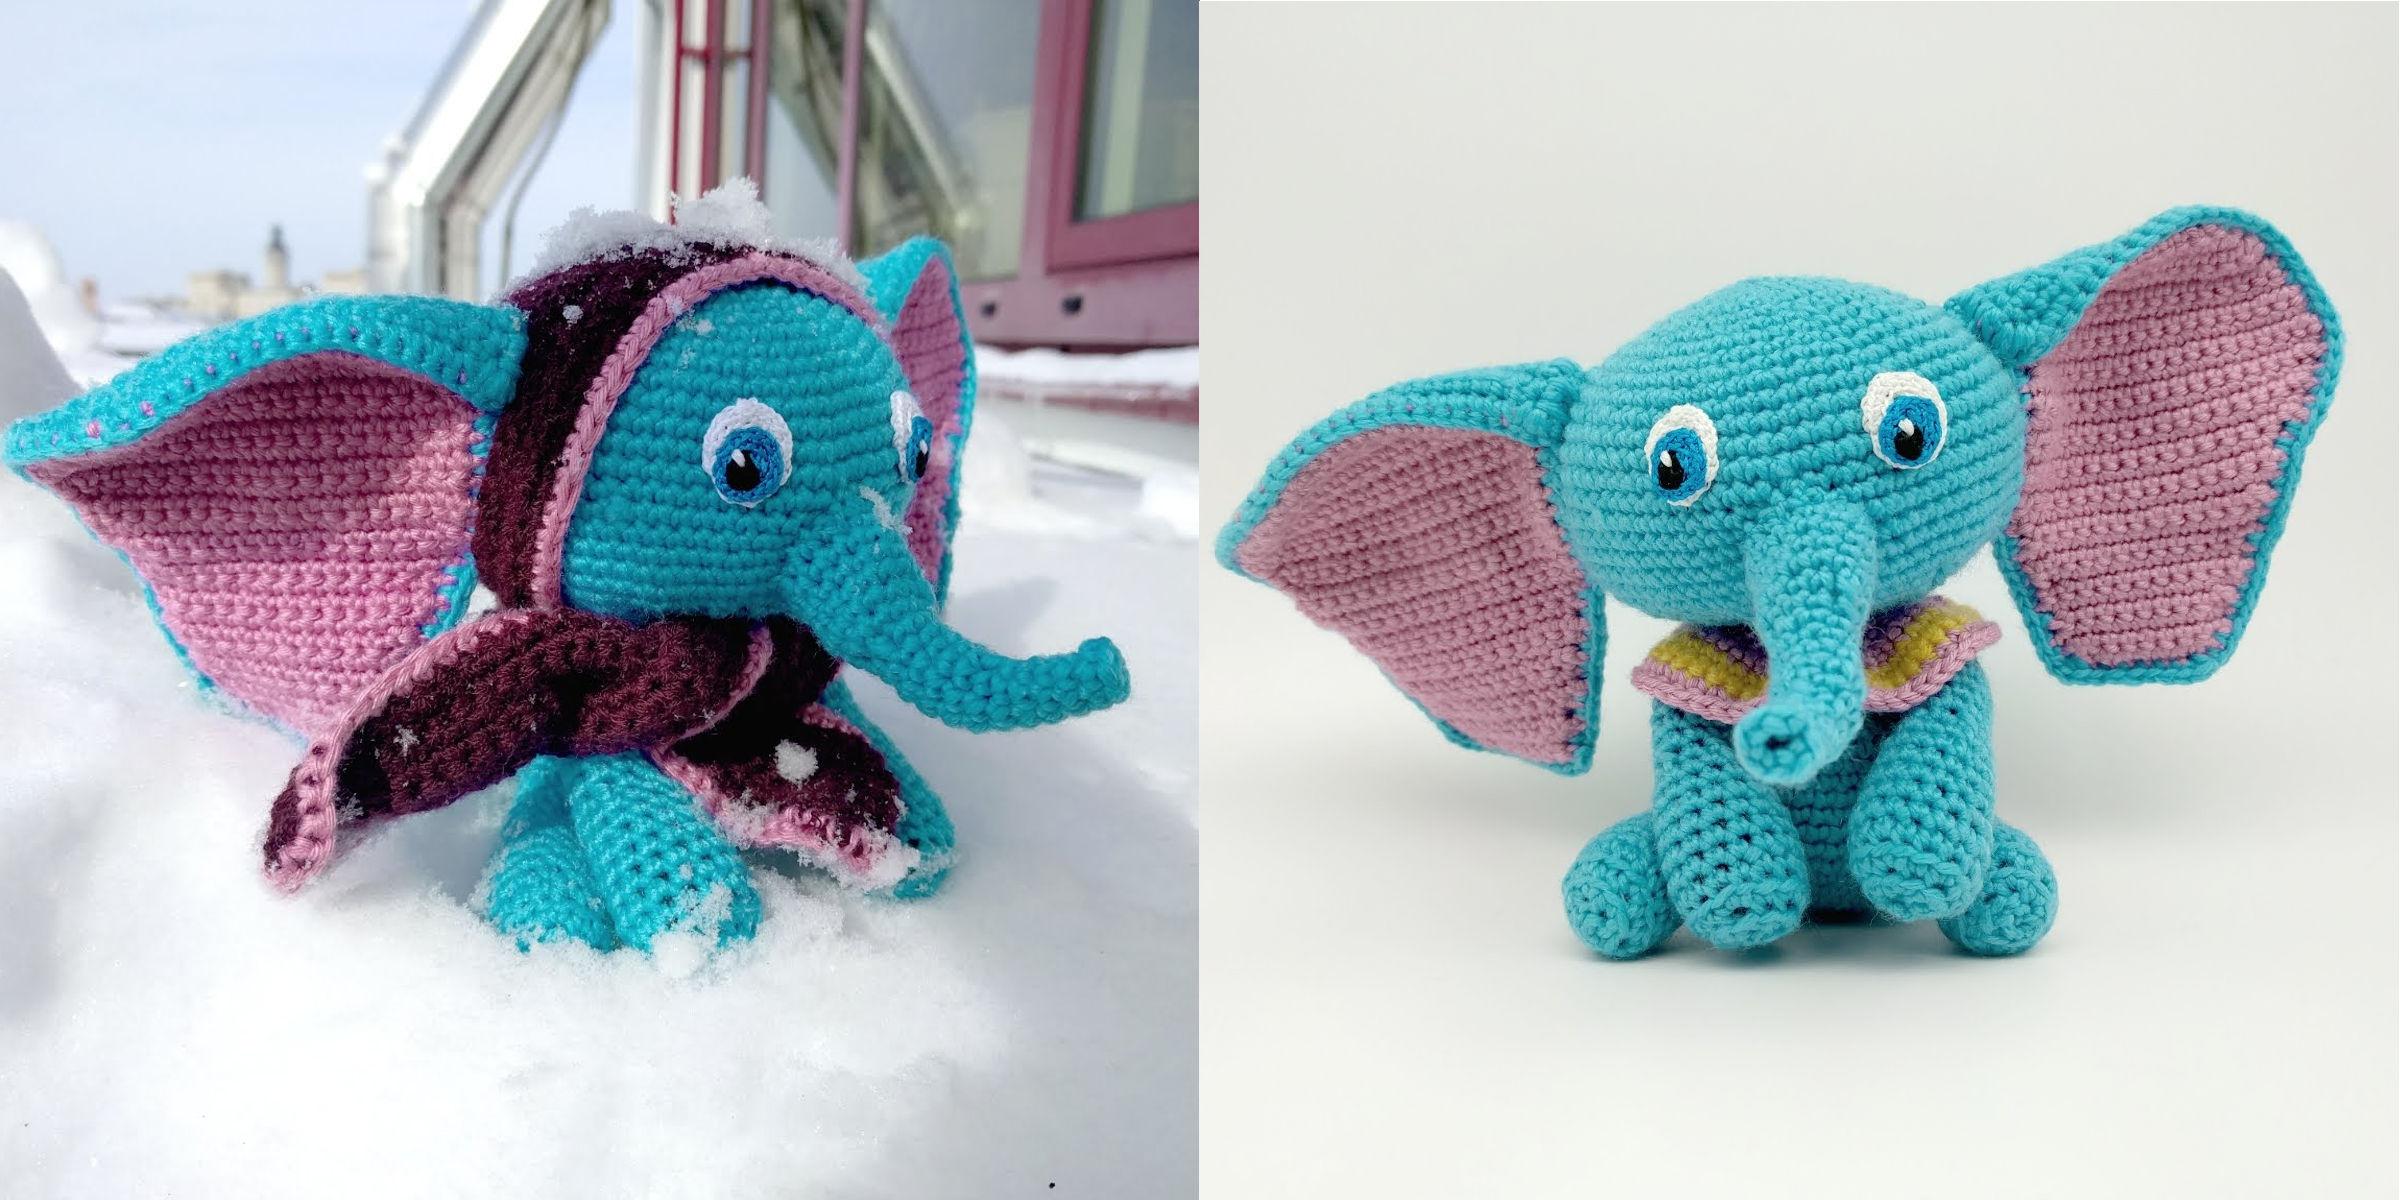 Ebby Der Blaue Elefant Parivonnes Häkelblog